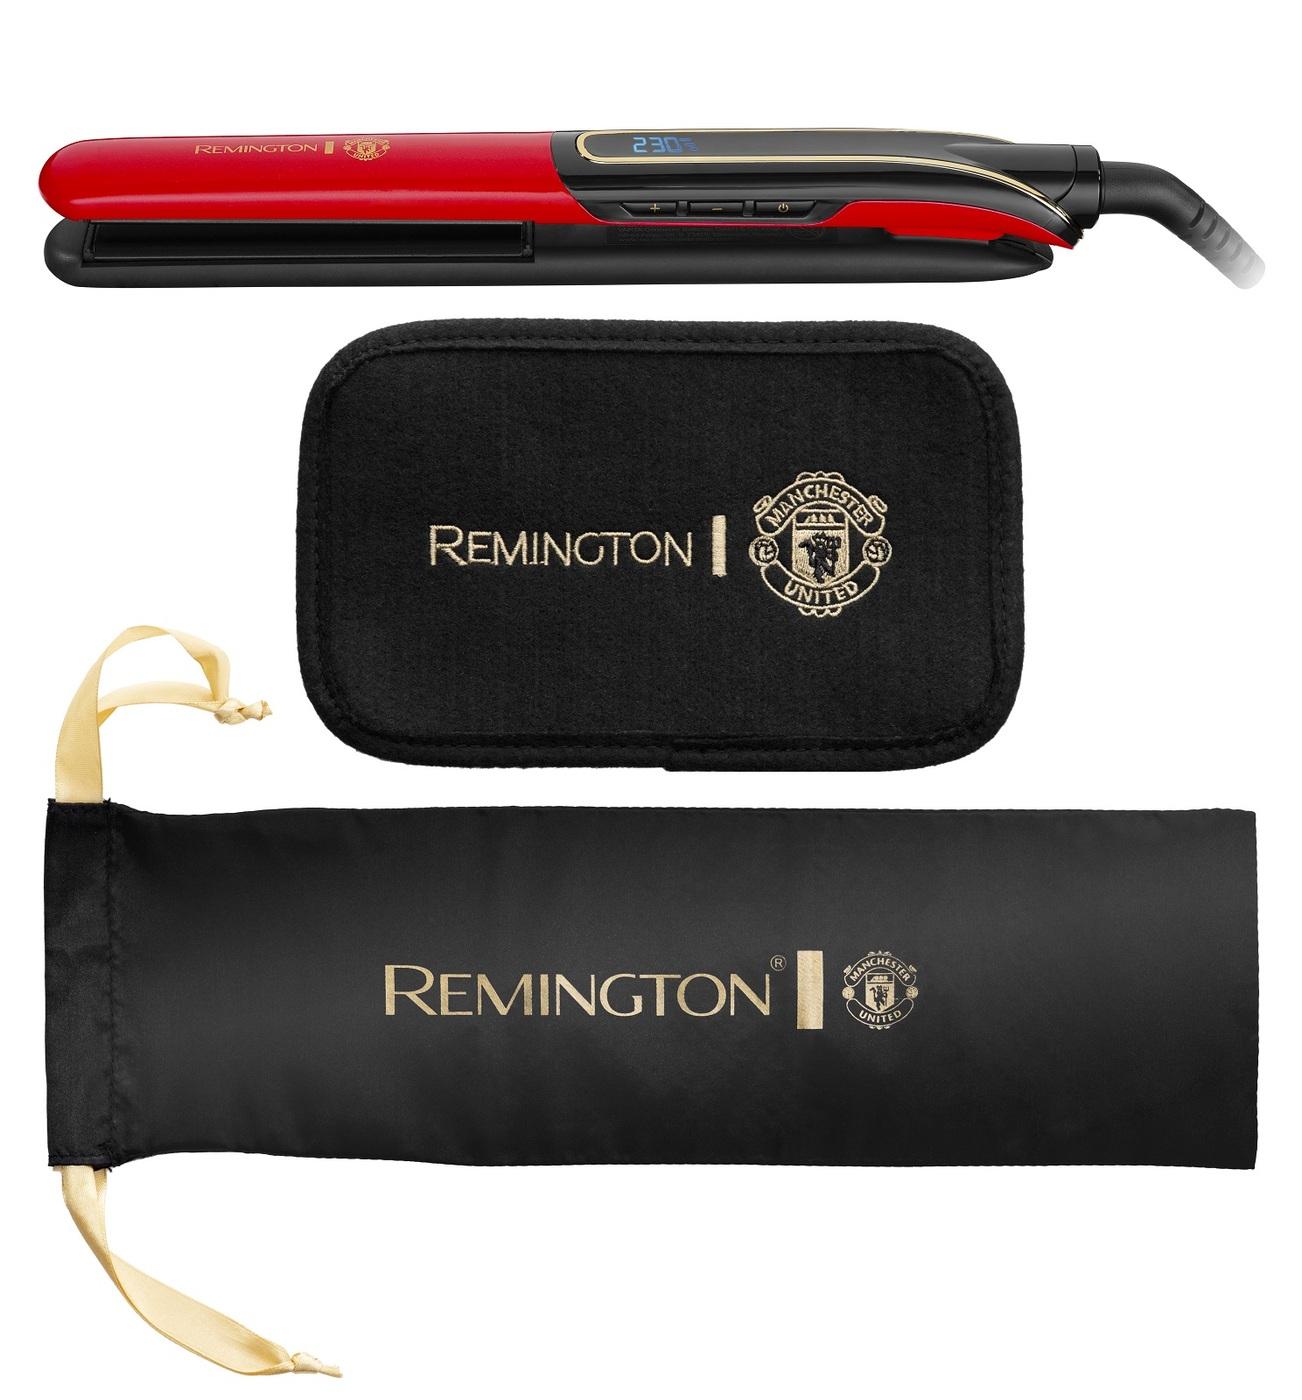 Выпрямитель Remington S6755 Manchester United Sleek & Curl Expert